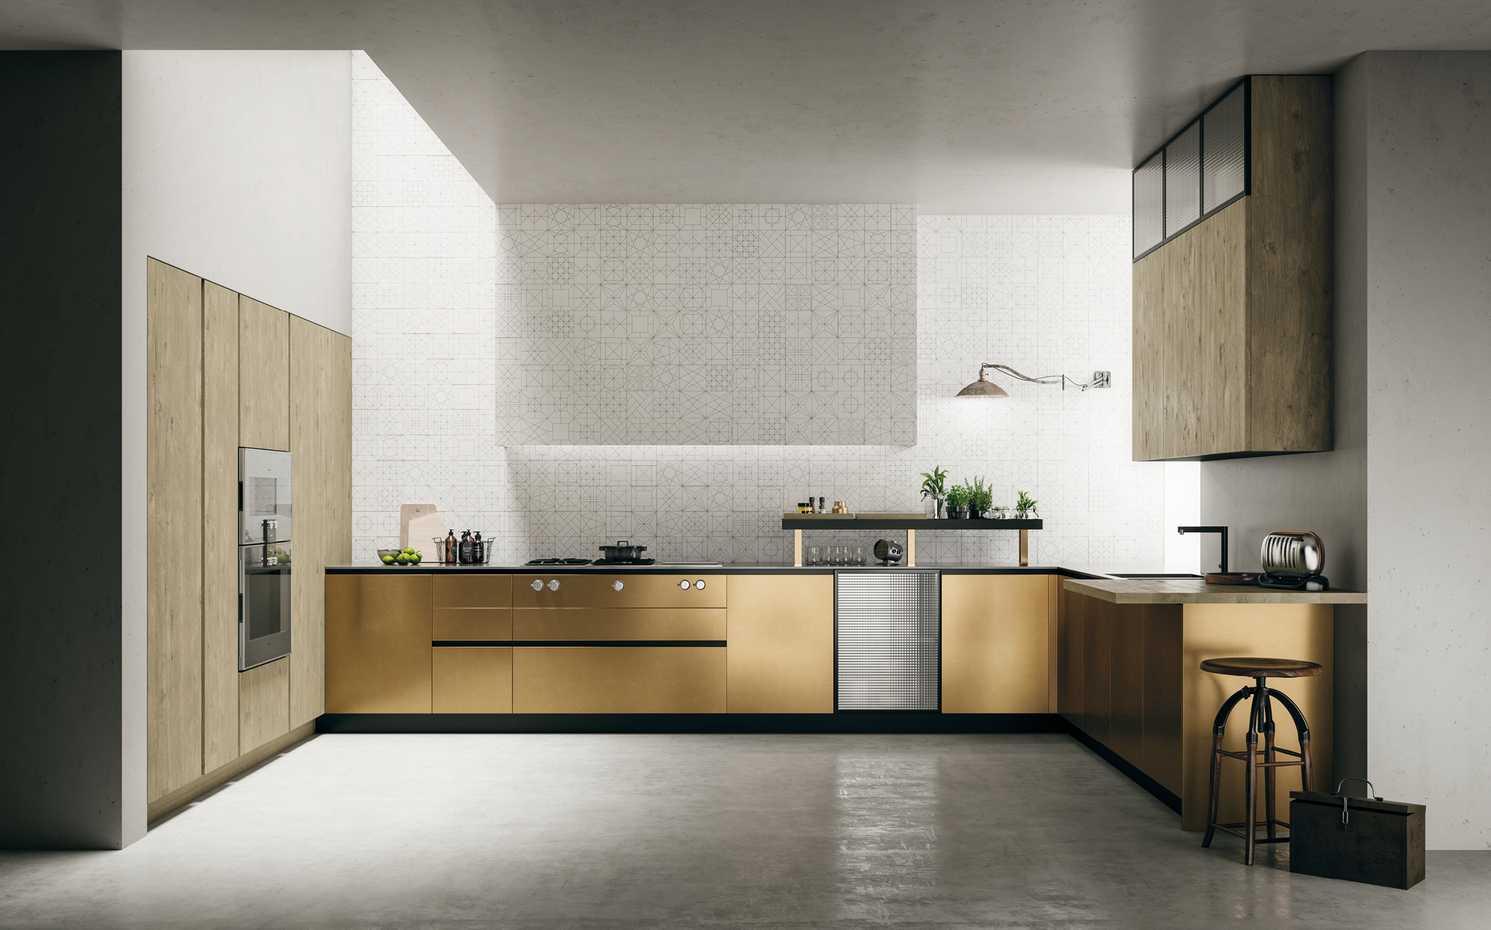 SoHo by Doimo Cucine product image 6